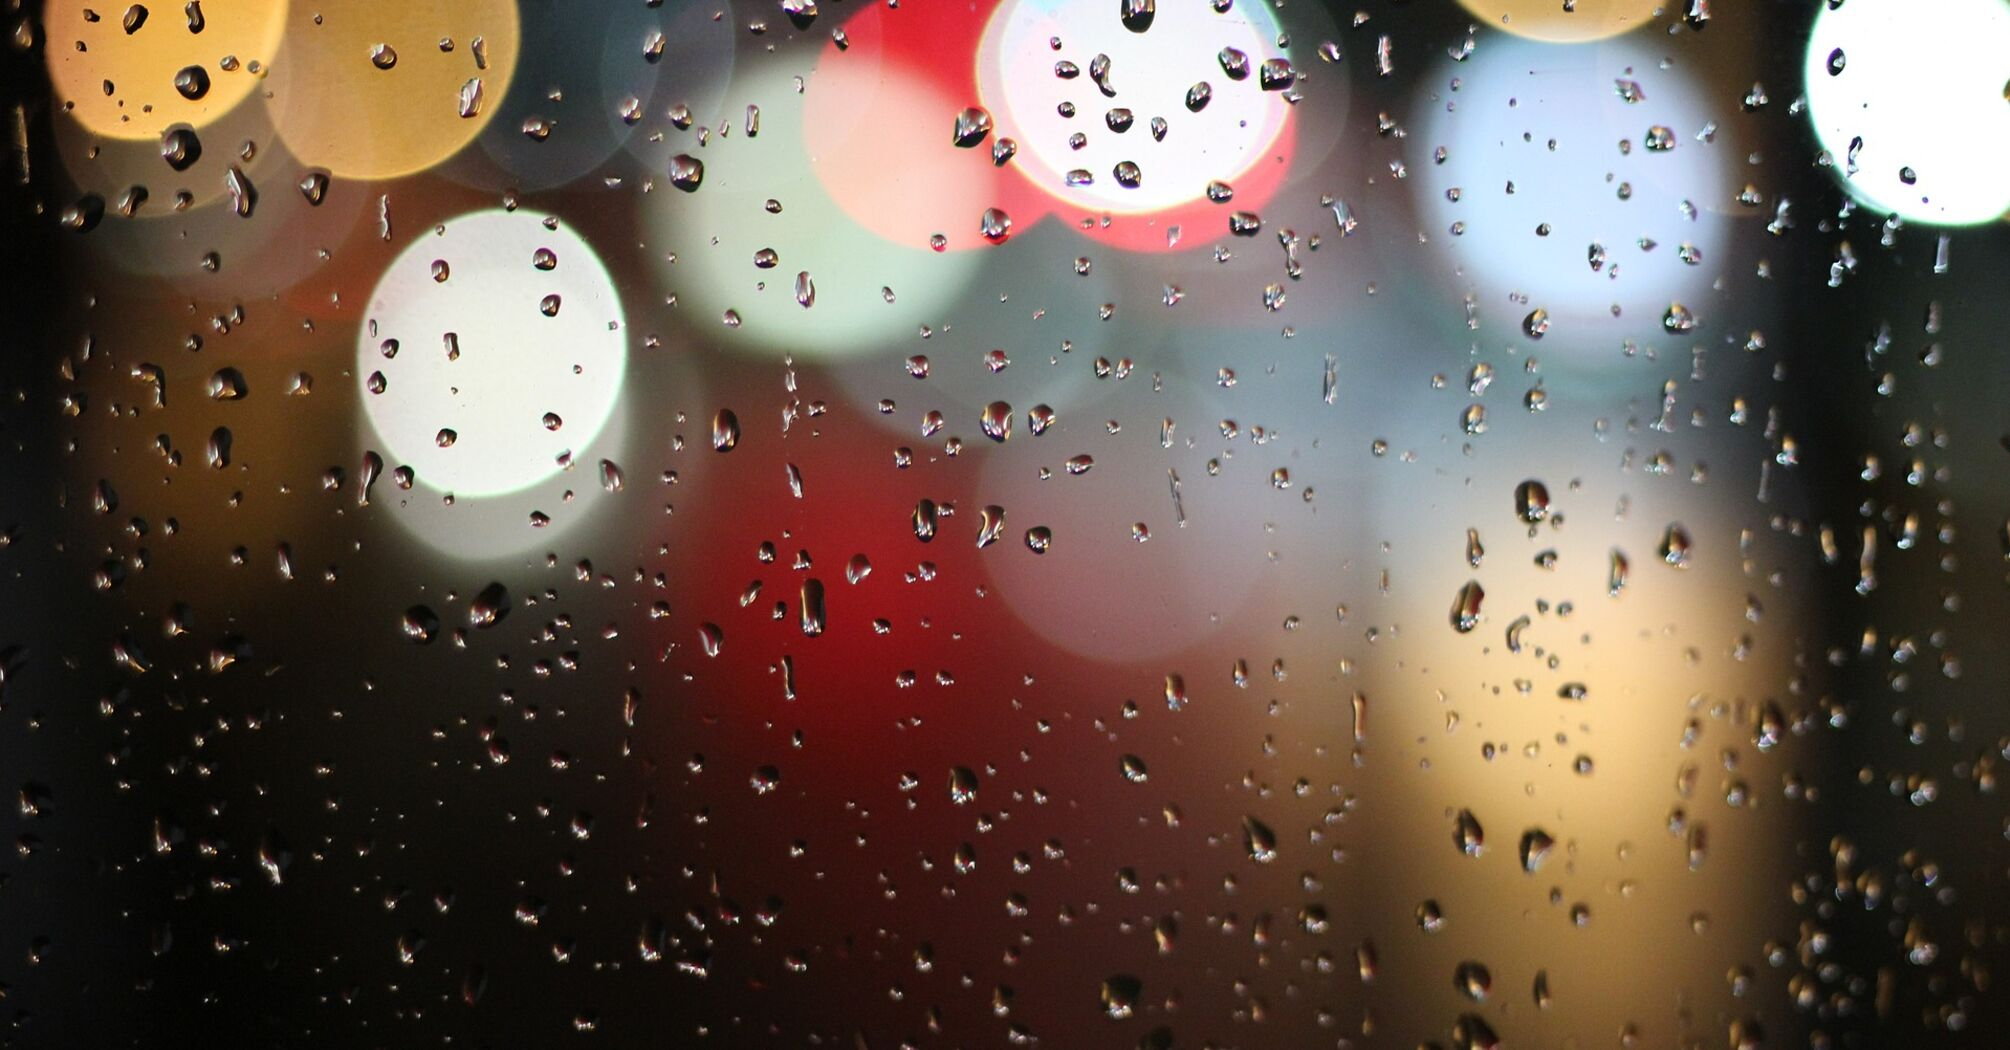 Украину накроют ливни, температура воздуха упадет: синоптики дали прогноз на неделю